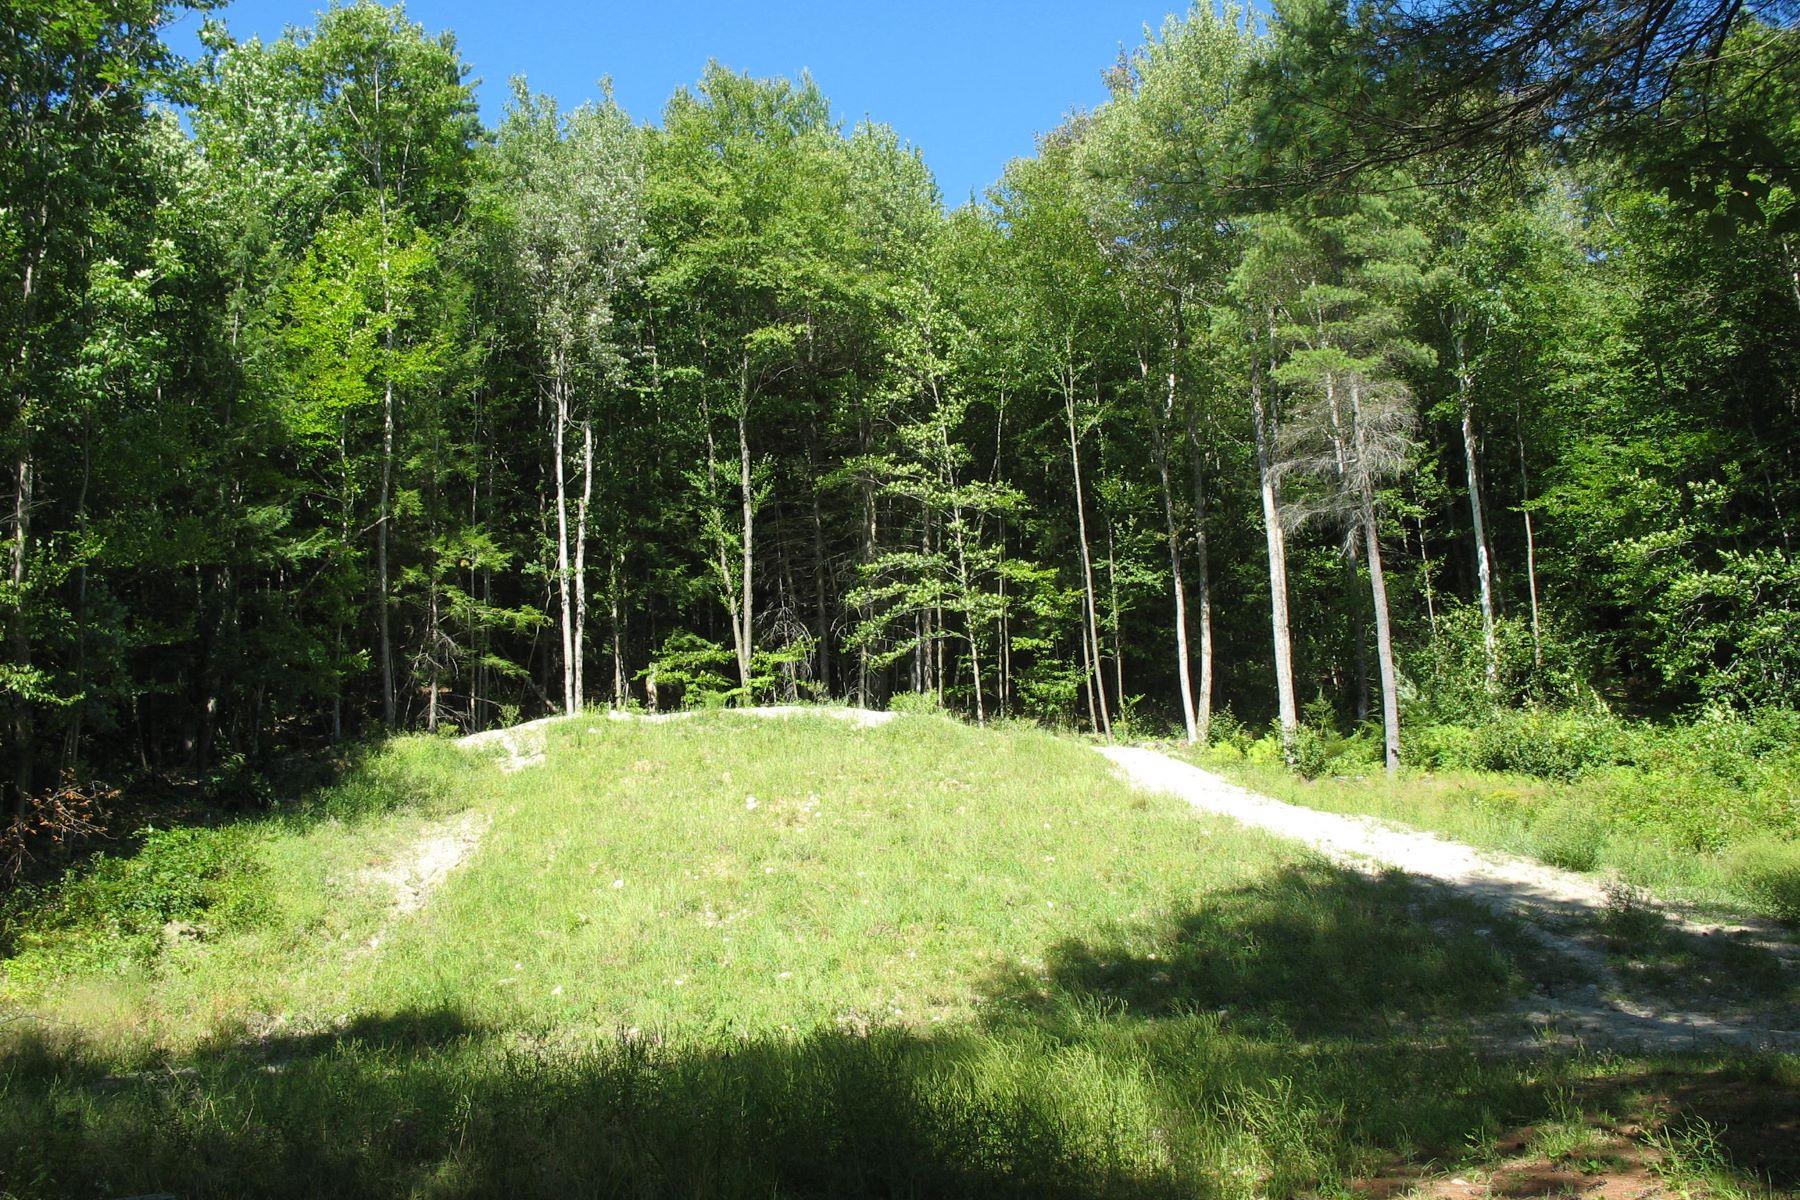 Land for Sale at 175 Sunset Rock Road, Lebanon 175 Sunset Rock Rd Lebanon, New Hampshire, 03766 United States